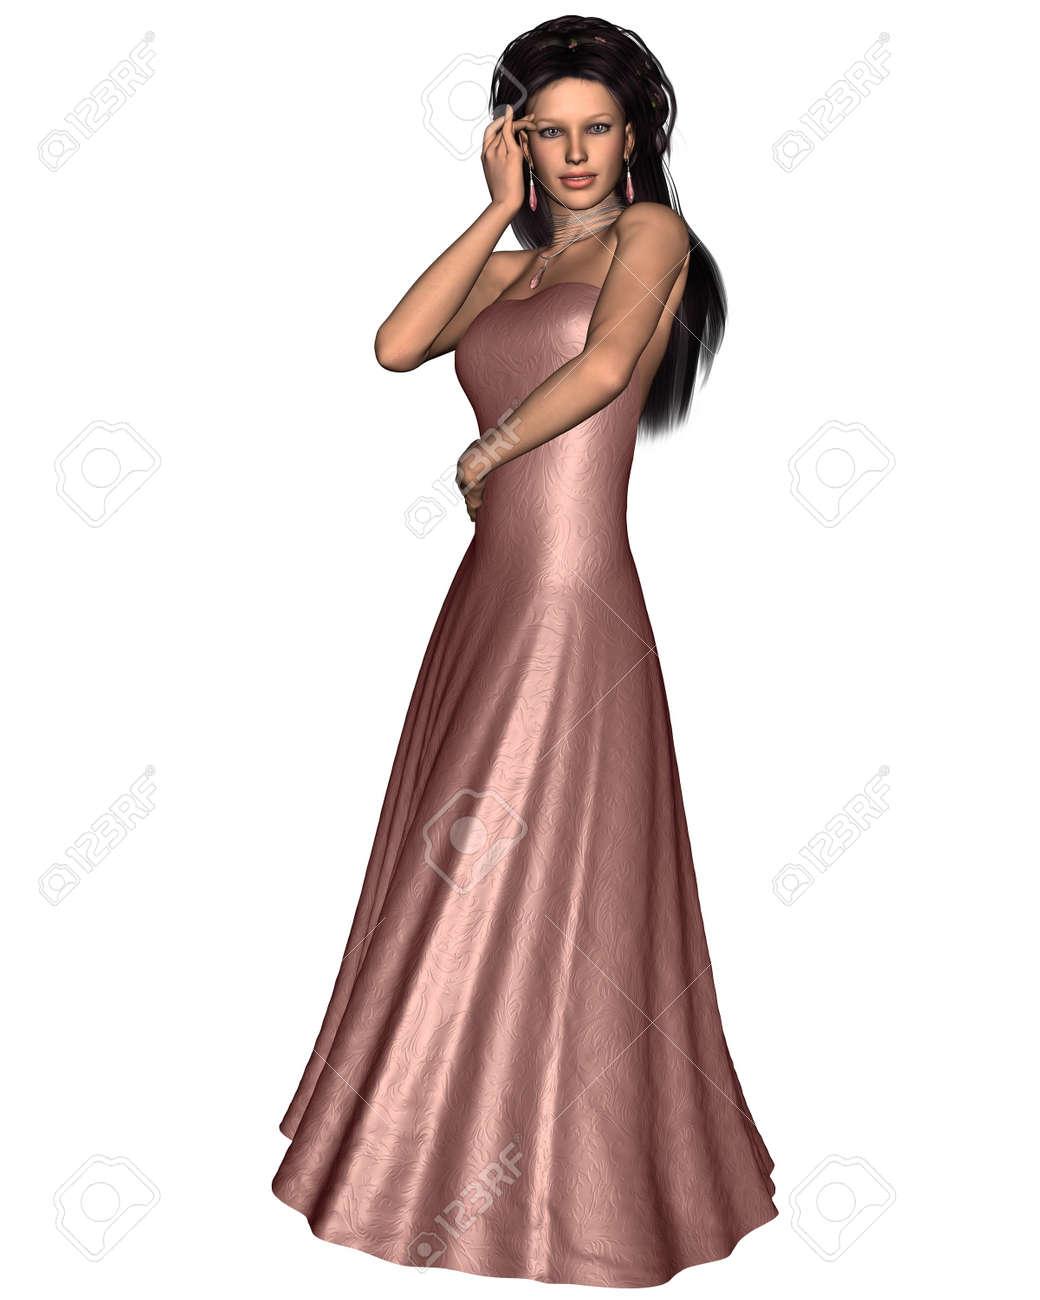 Beautiful Dark Haired Woman Wearing A Pink Silk Evening Dress ...